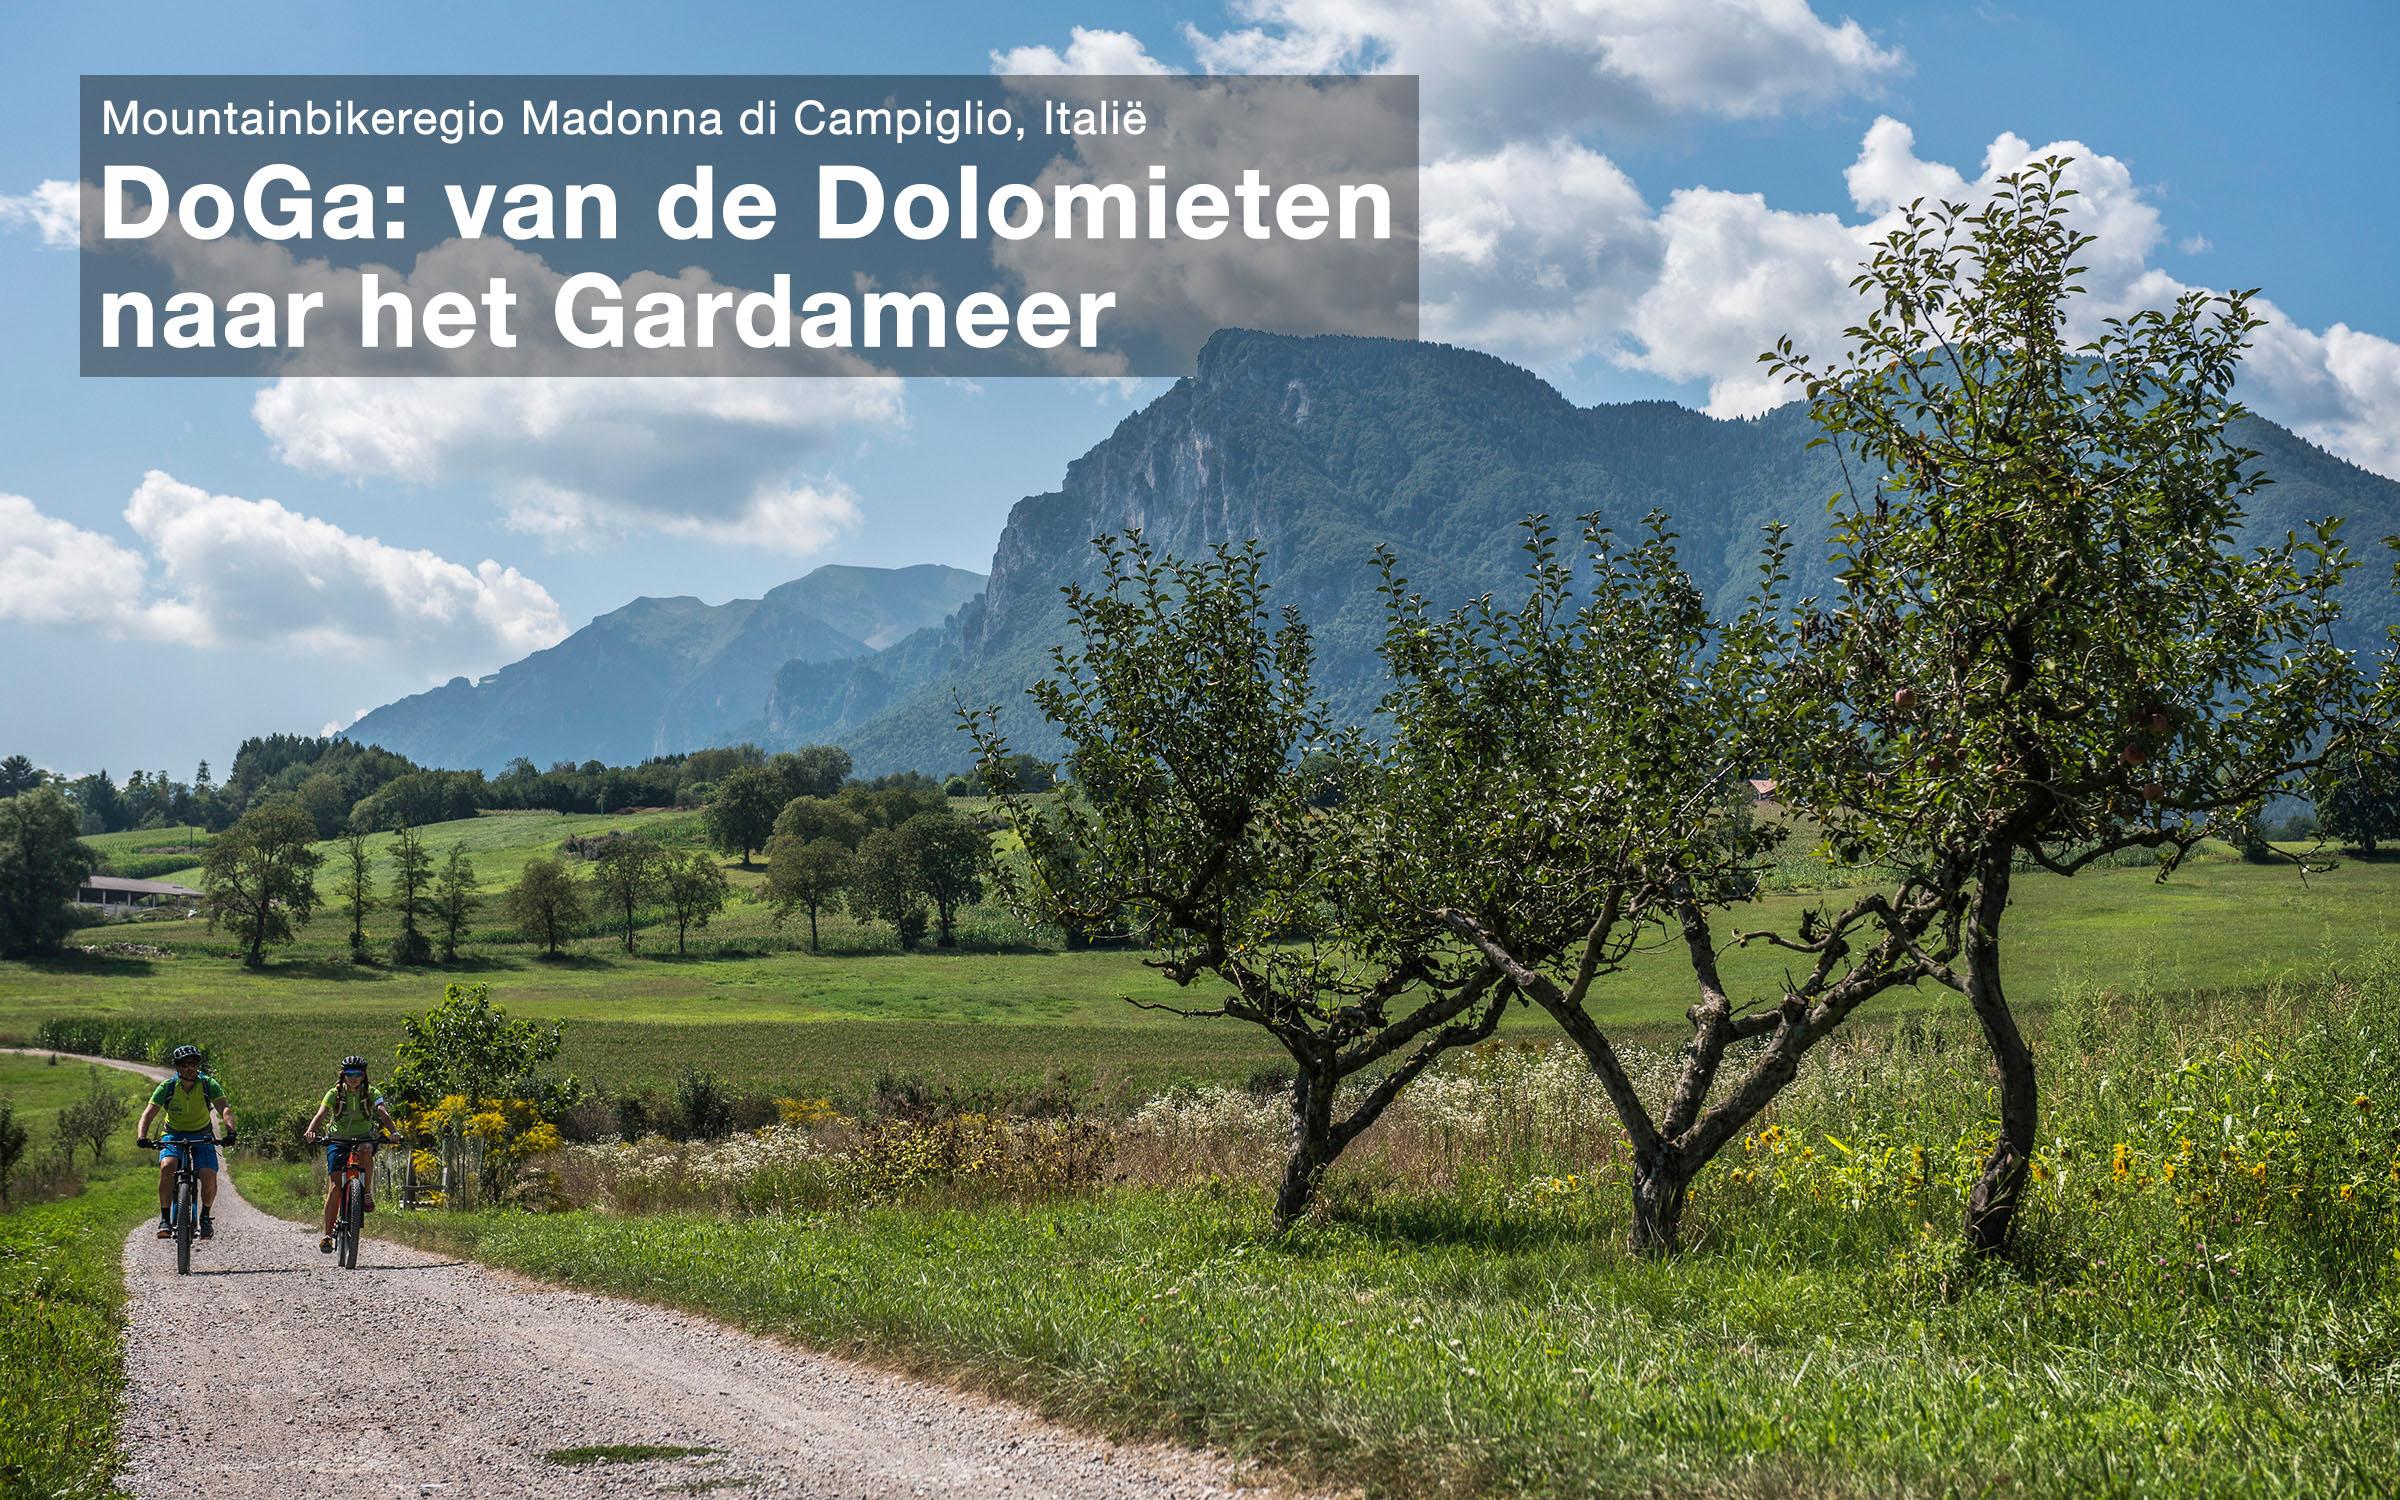 Gravelroute en mountainbikeroute van Madonna di Campiglio naar Riva del Garda, Italië